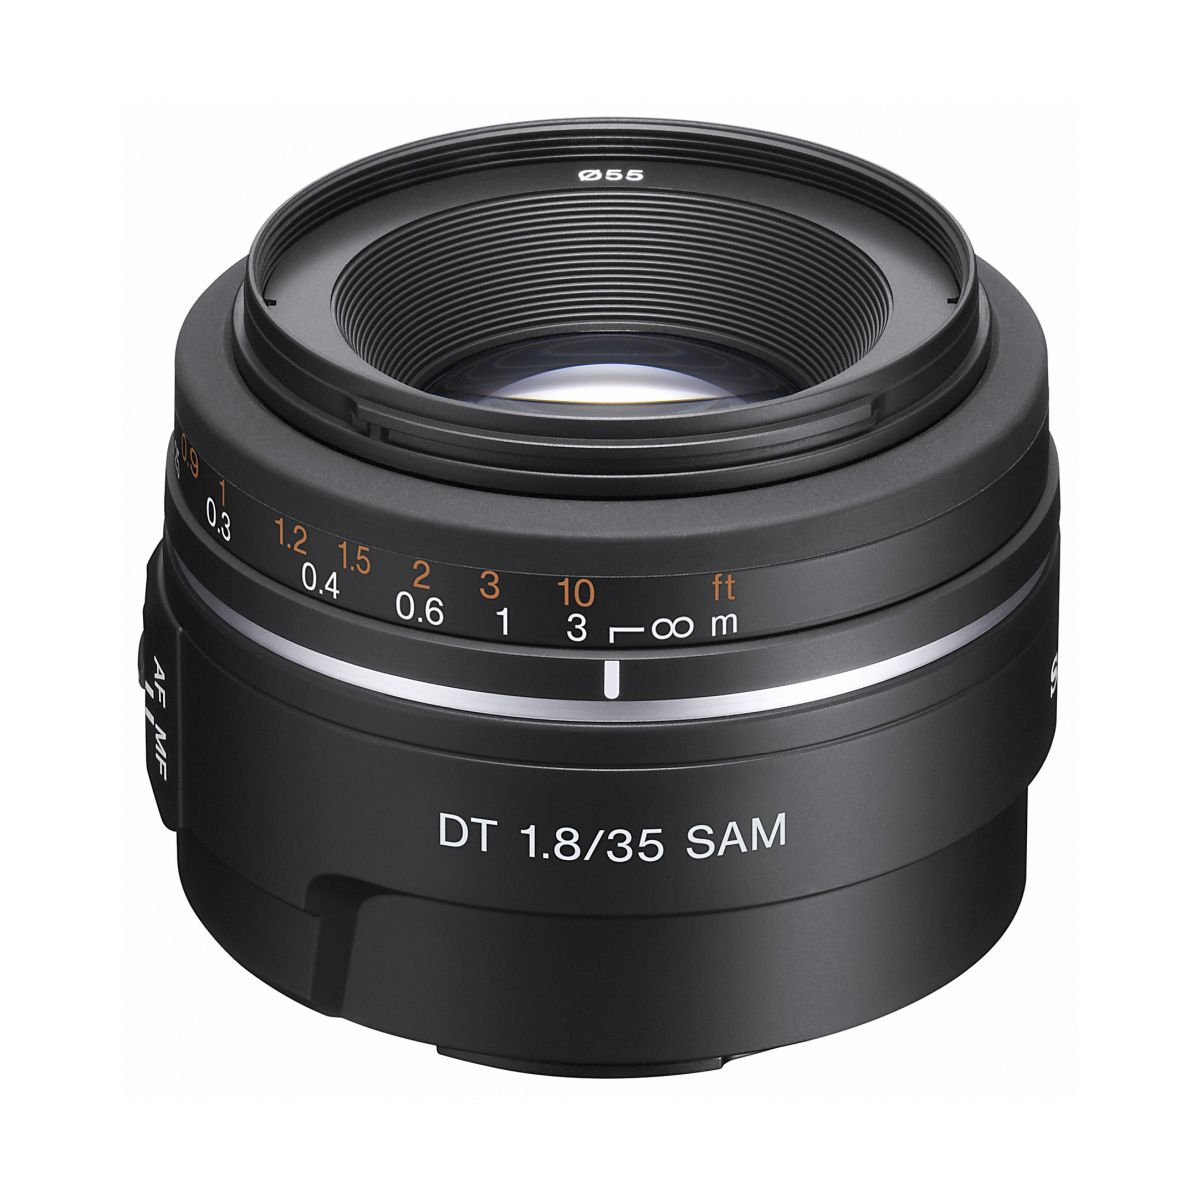 Objectif SONY SAL 35mm f 1.8 Objectif de type A DT 35mm F1.8SAM (pour tous les reflex SONY)